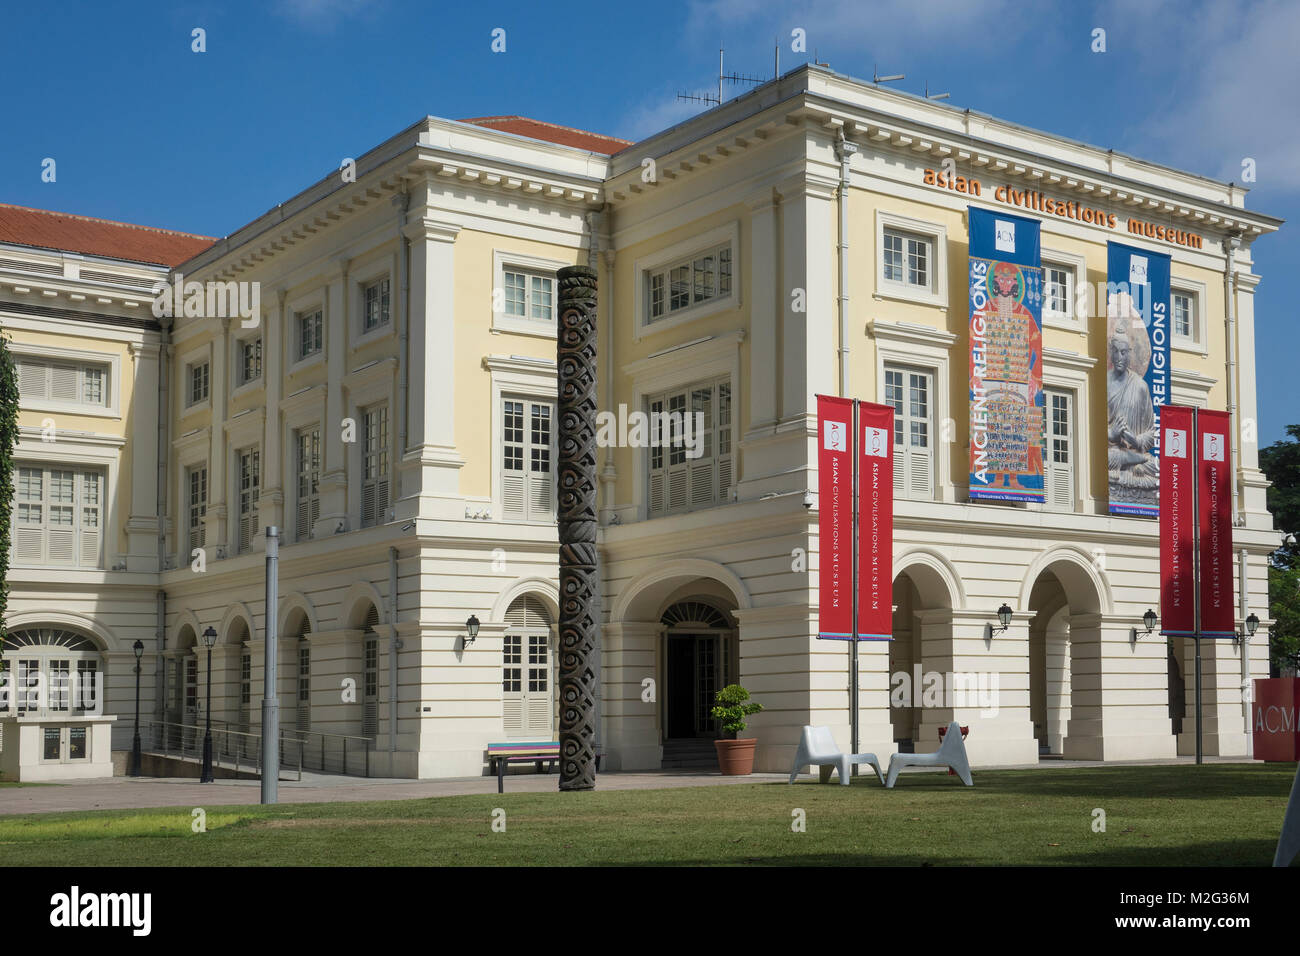 Singapore, Asian Civilisations Museum - Stock Image